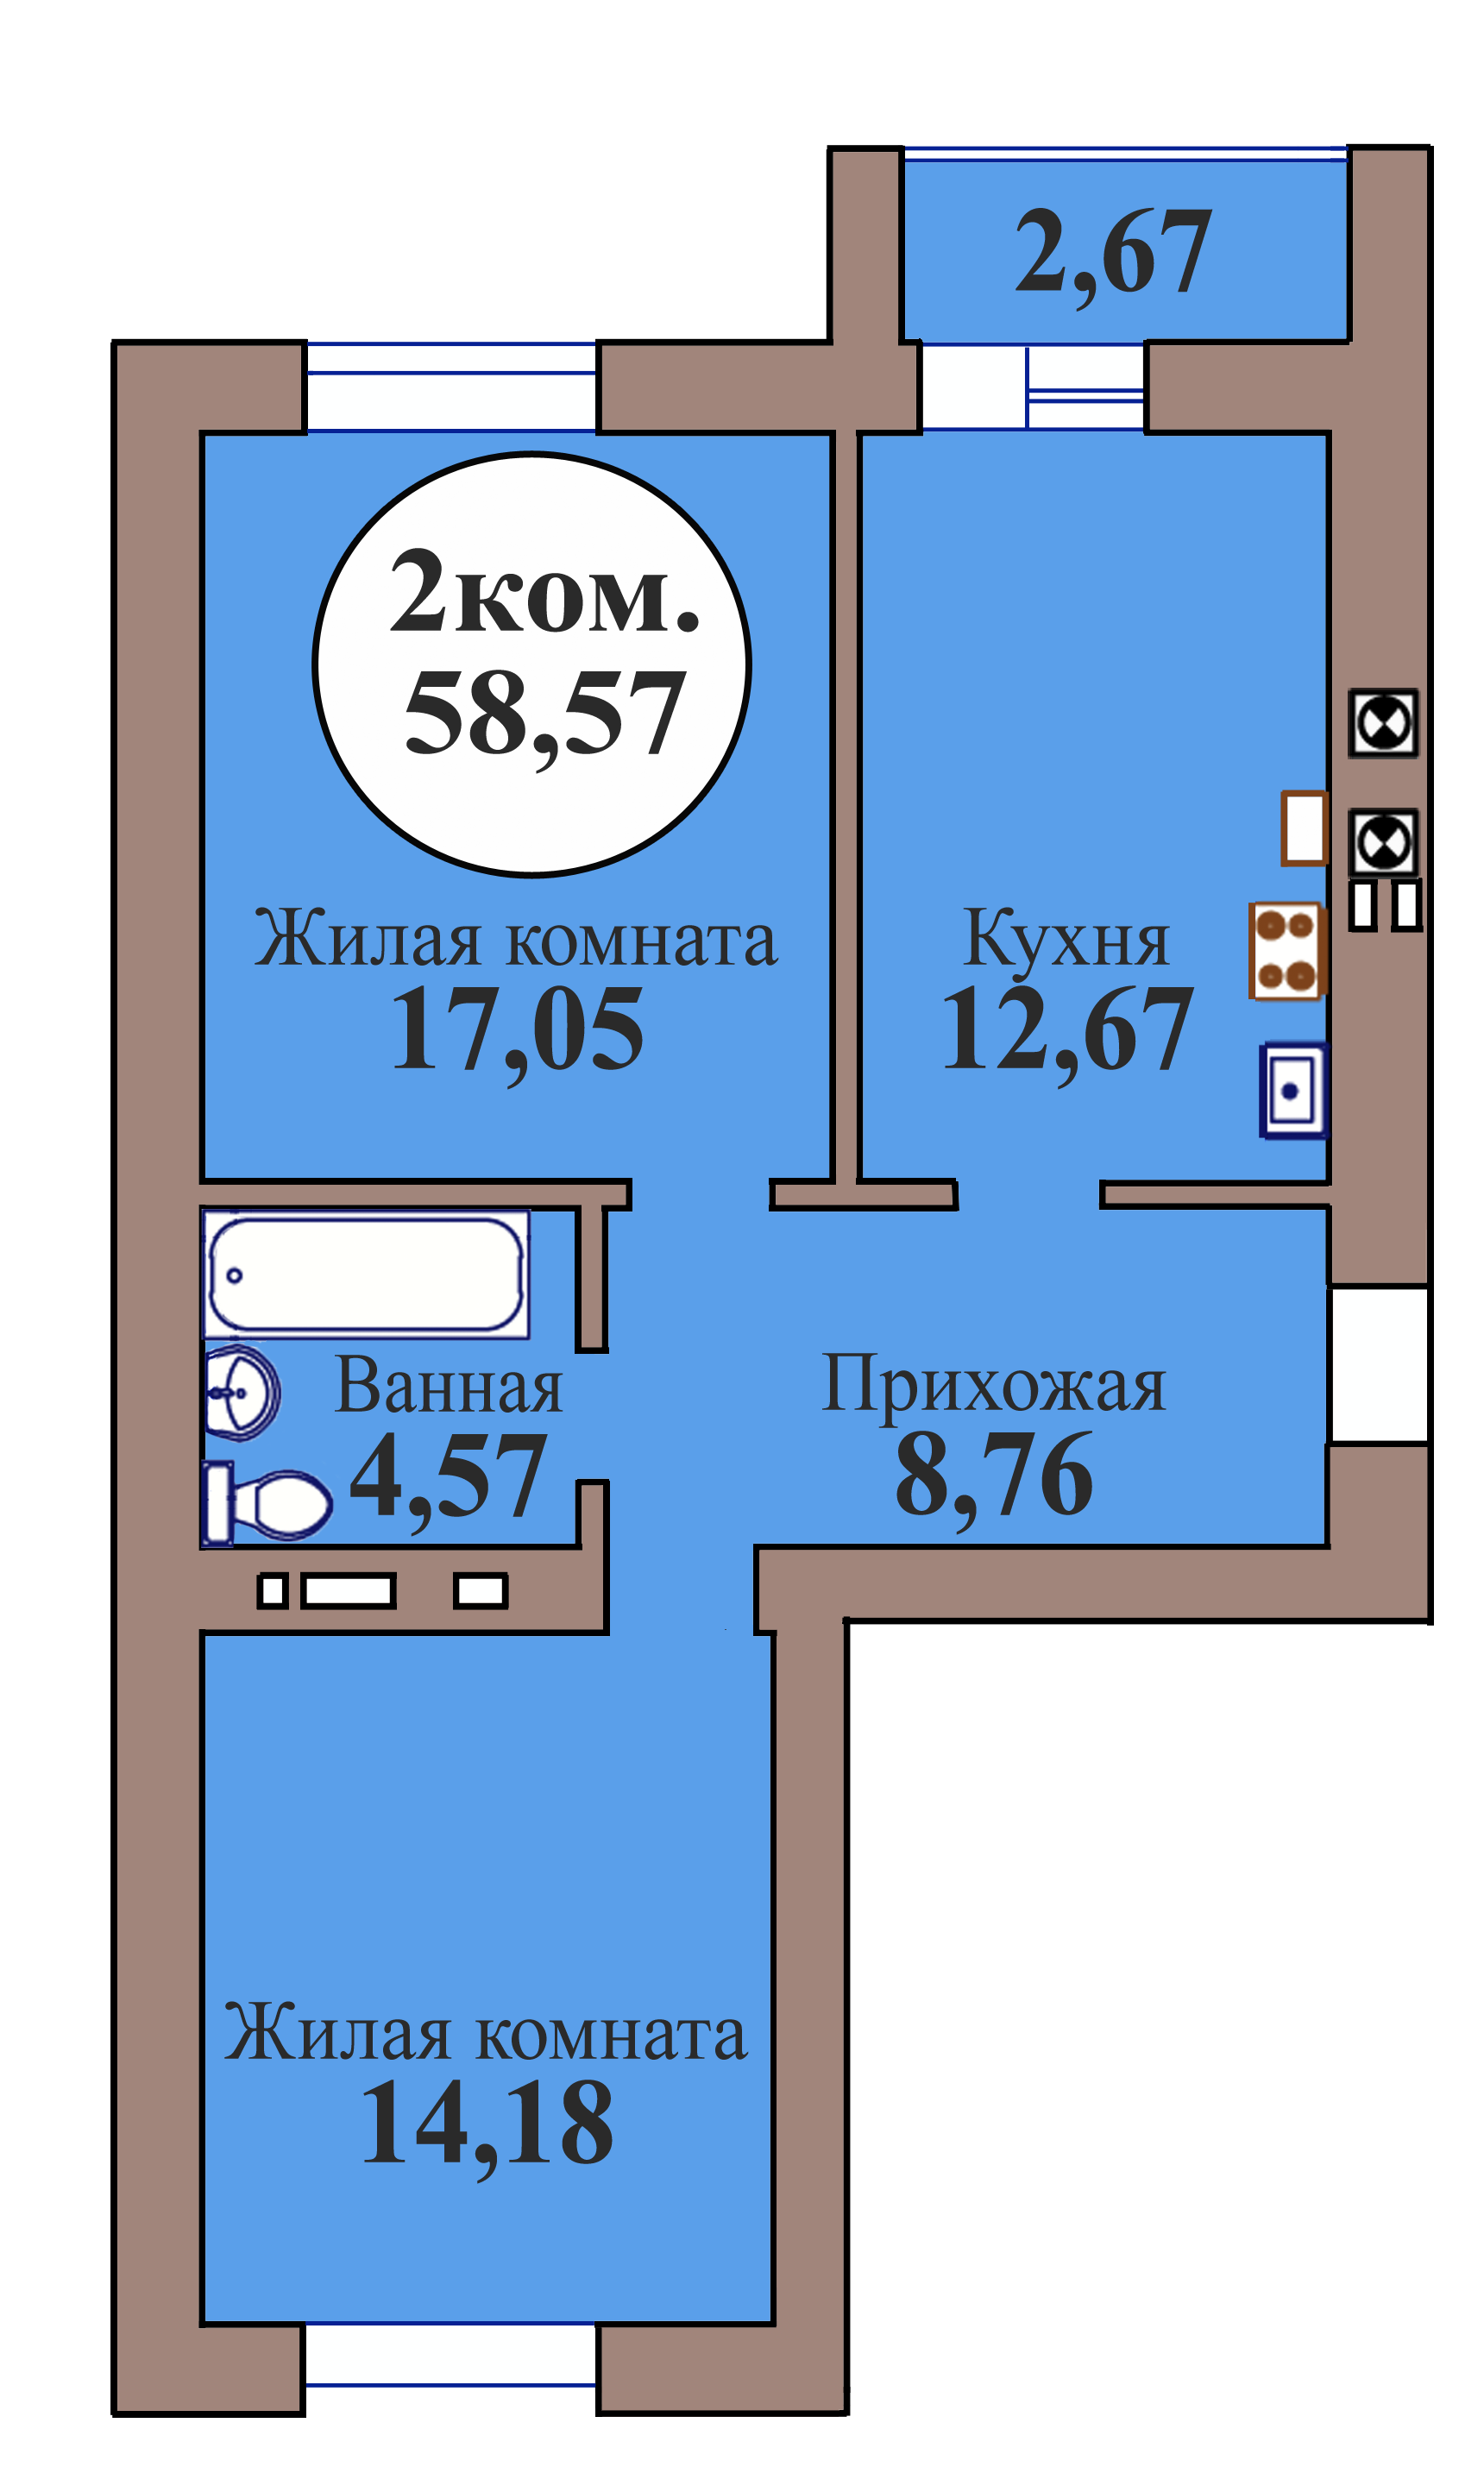 2-комн. кв. по пер. Калининградский, 5 кв. 115 в Калининграде